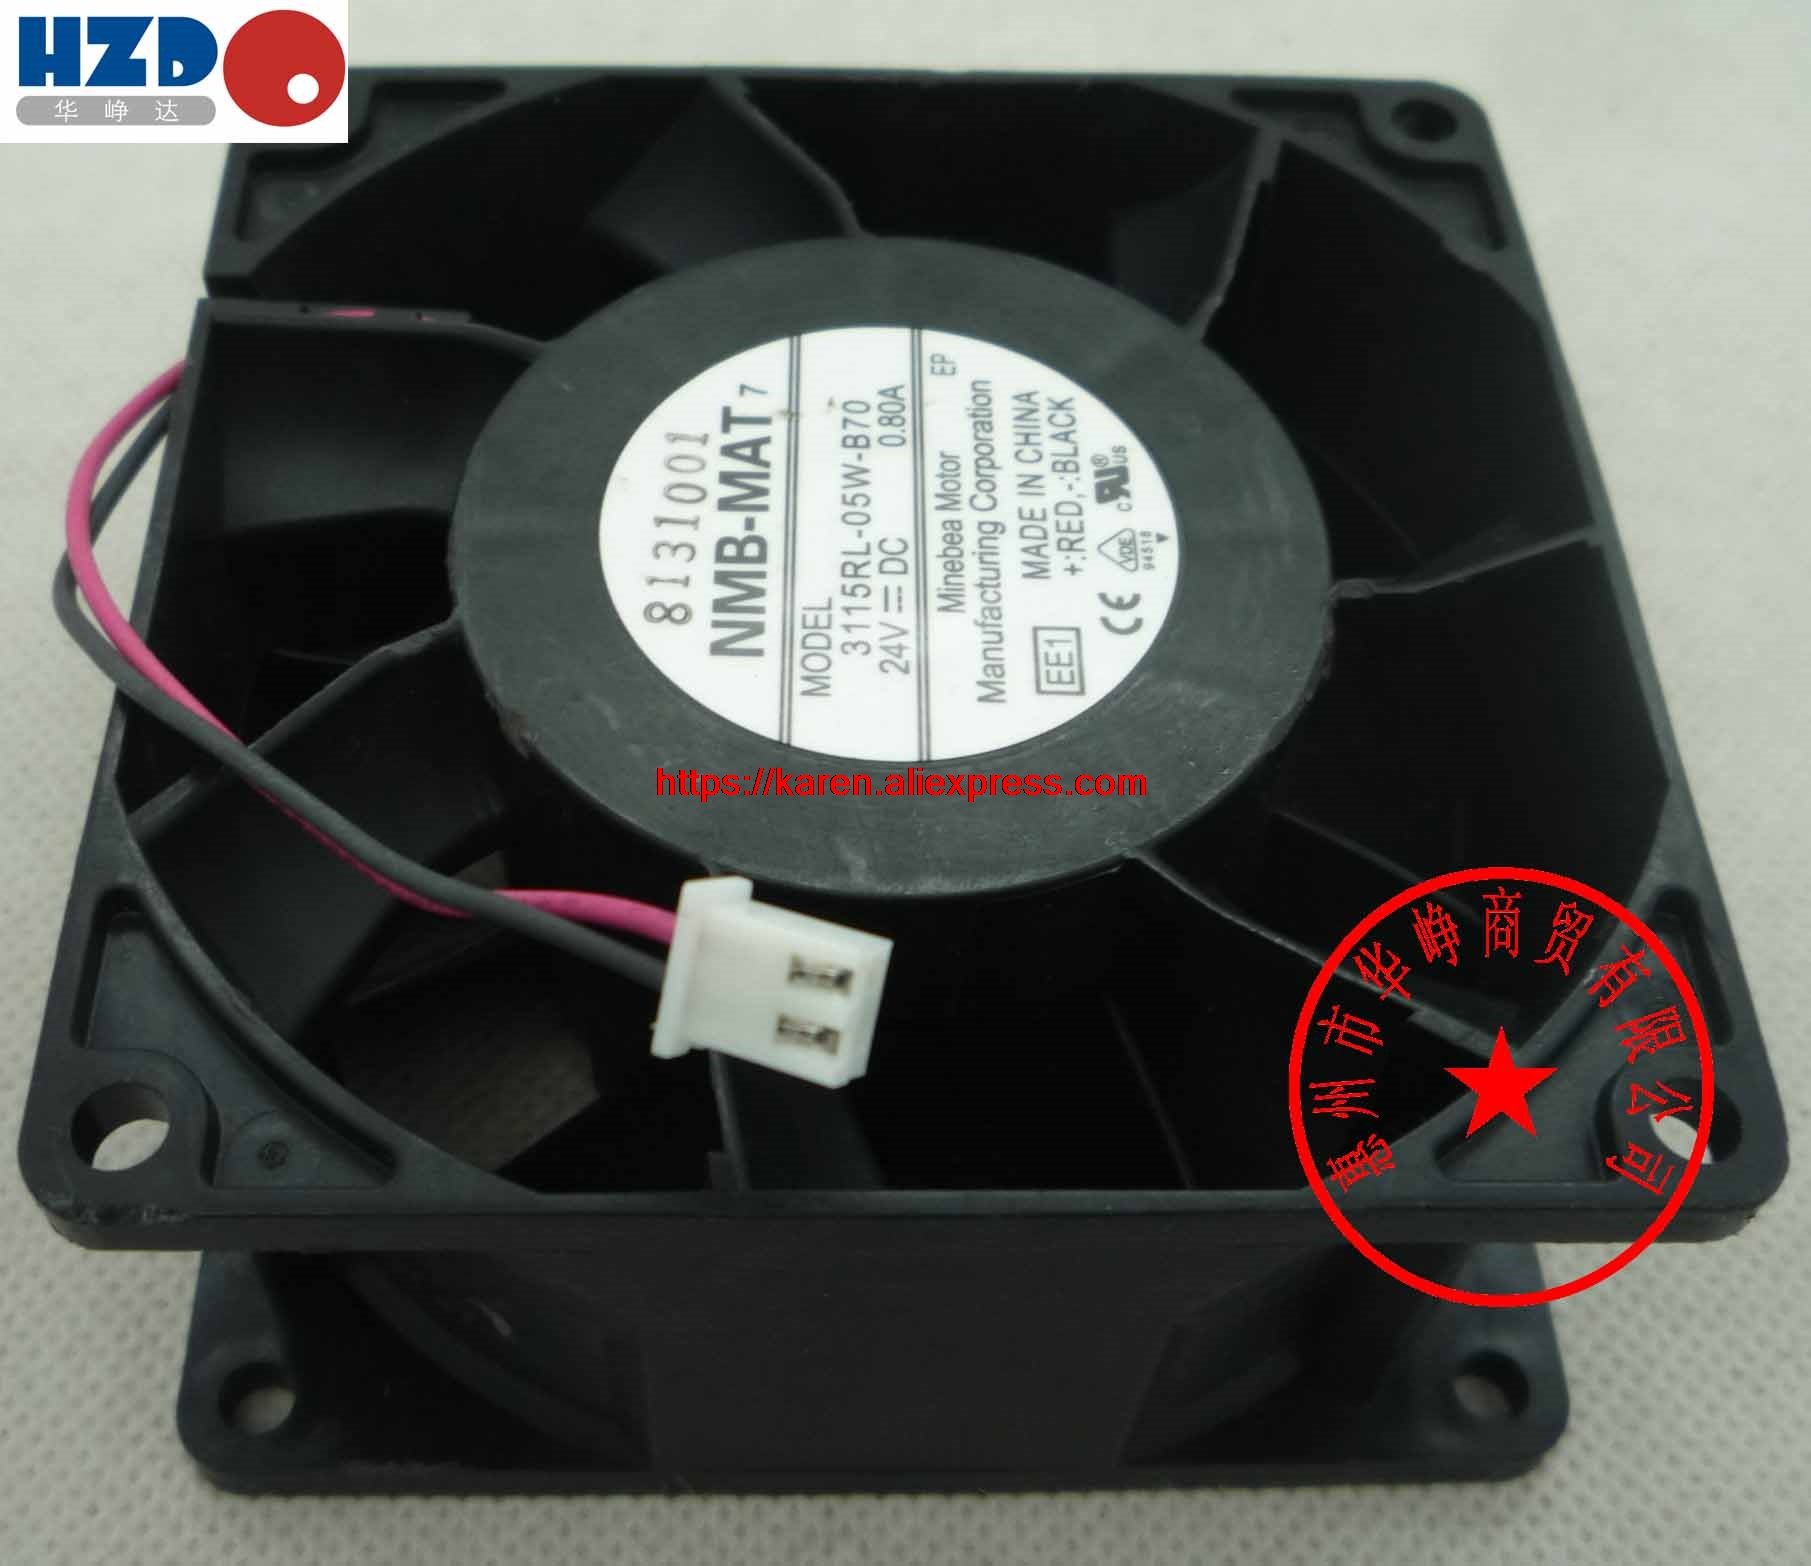 NMB 3115RL-05W-B70 0.8A 8cm 8038 24V 0.9A MGT8024YB-W38 Cooling fan гирлянда с насадками richled 3x0 7 м rl psf3 0 7c w b